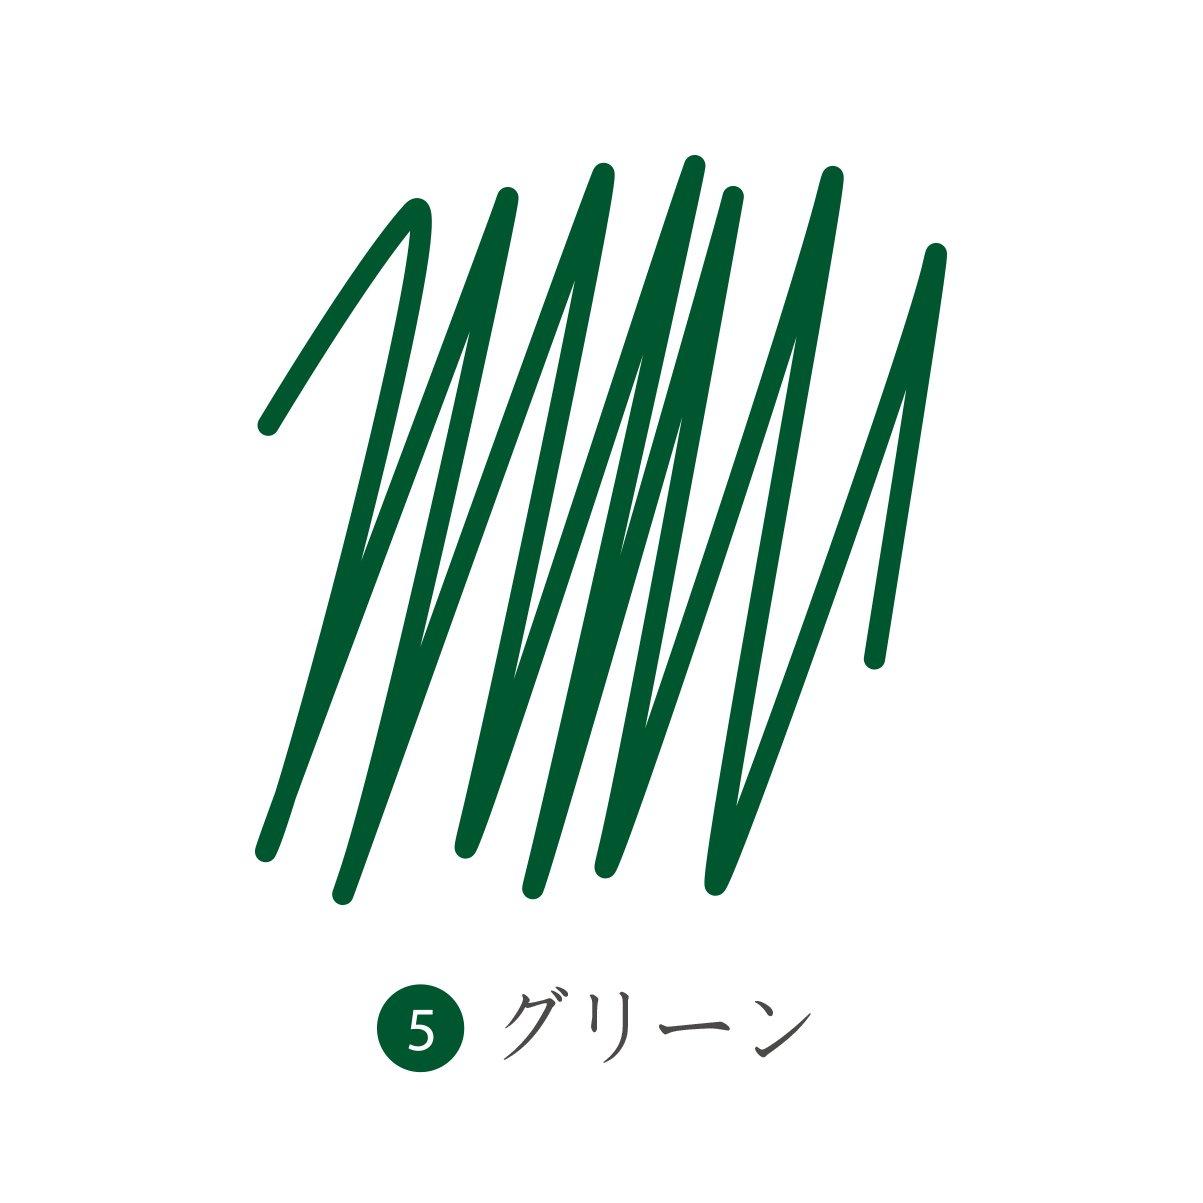 Staedtler Triplus Fineliner Pen - Green by STAEDTLER (Image #2)